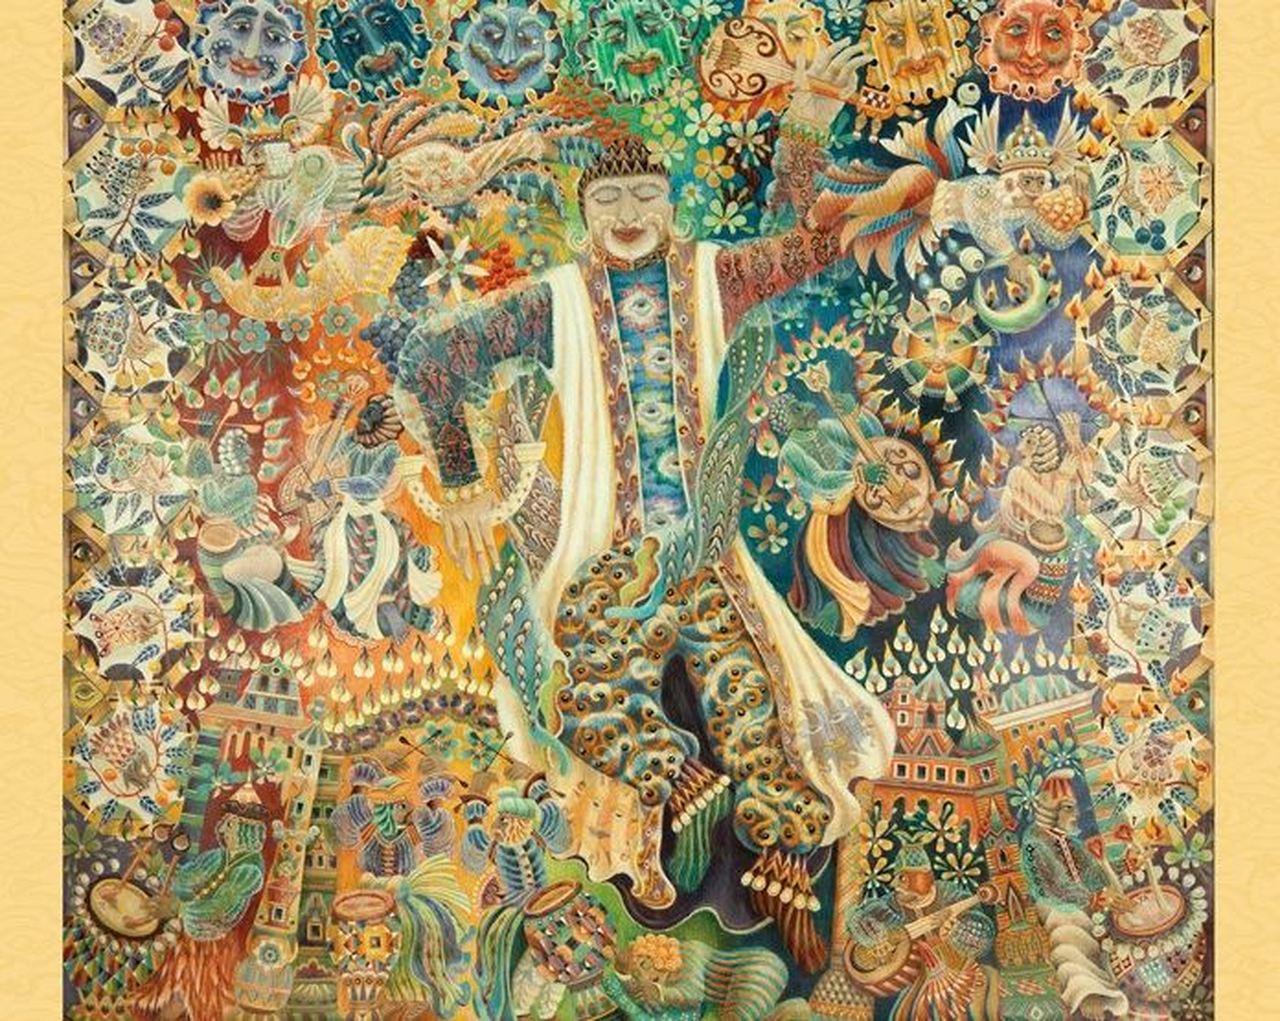 Celebration Contemporary & Modern Art Jigsaw Puzzle